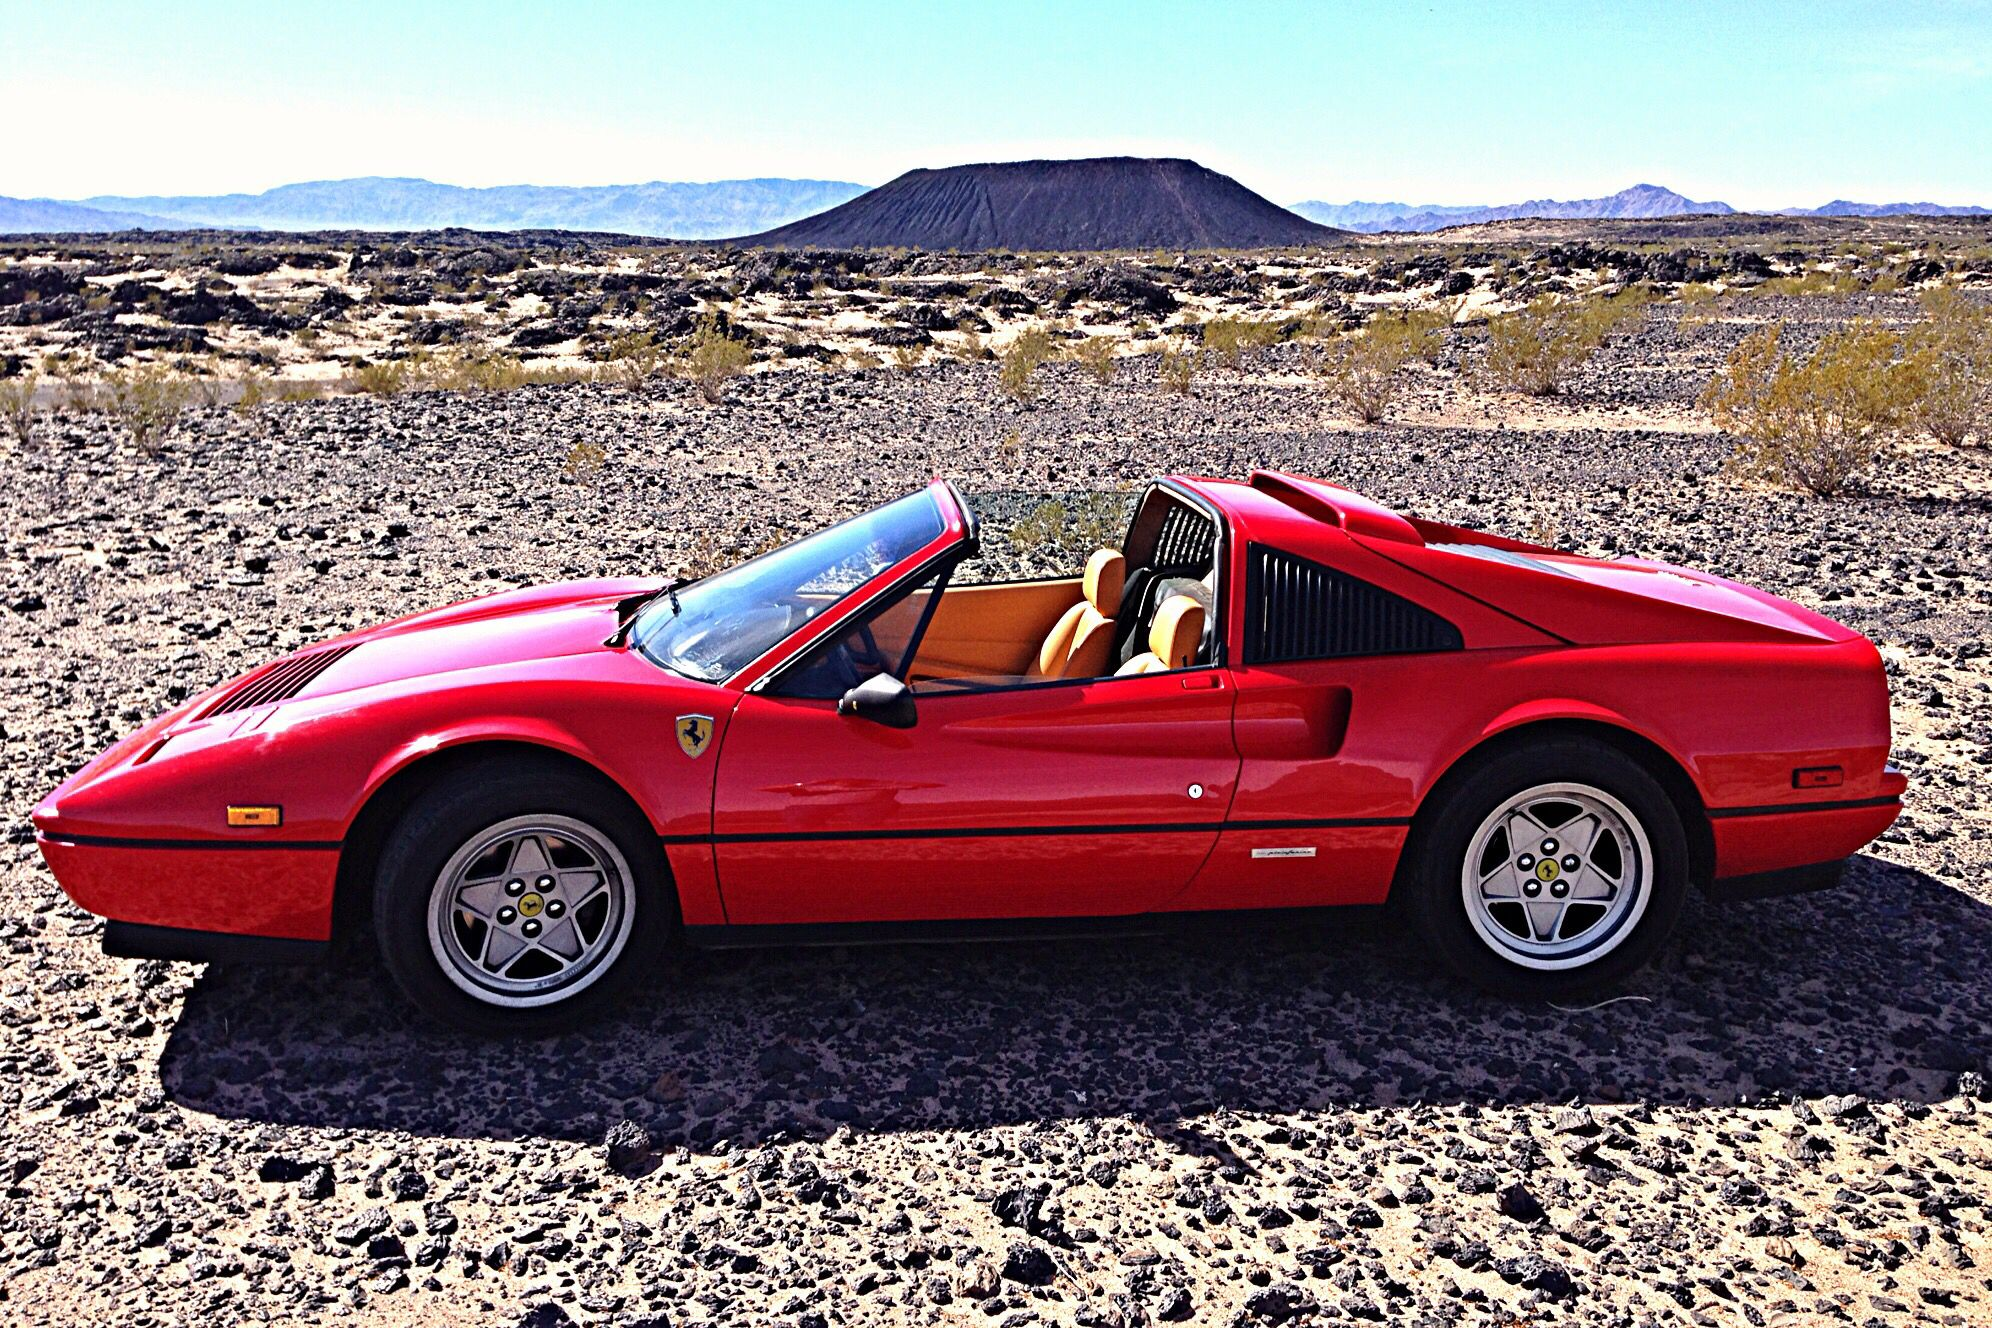 4538607d6dc500fdeb6ea13eabefdc47 Remarkable Ferrari Mondial Rear Window Motor Cars Trend